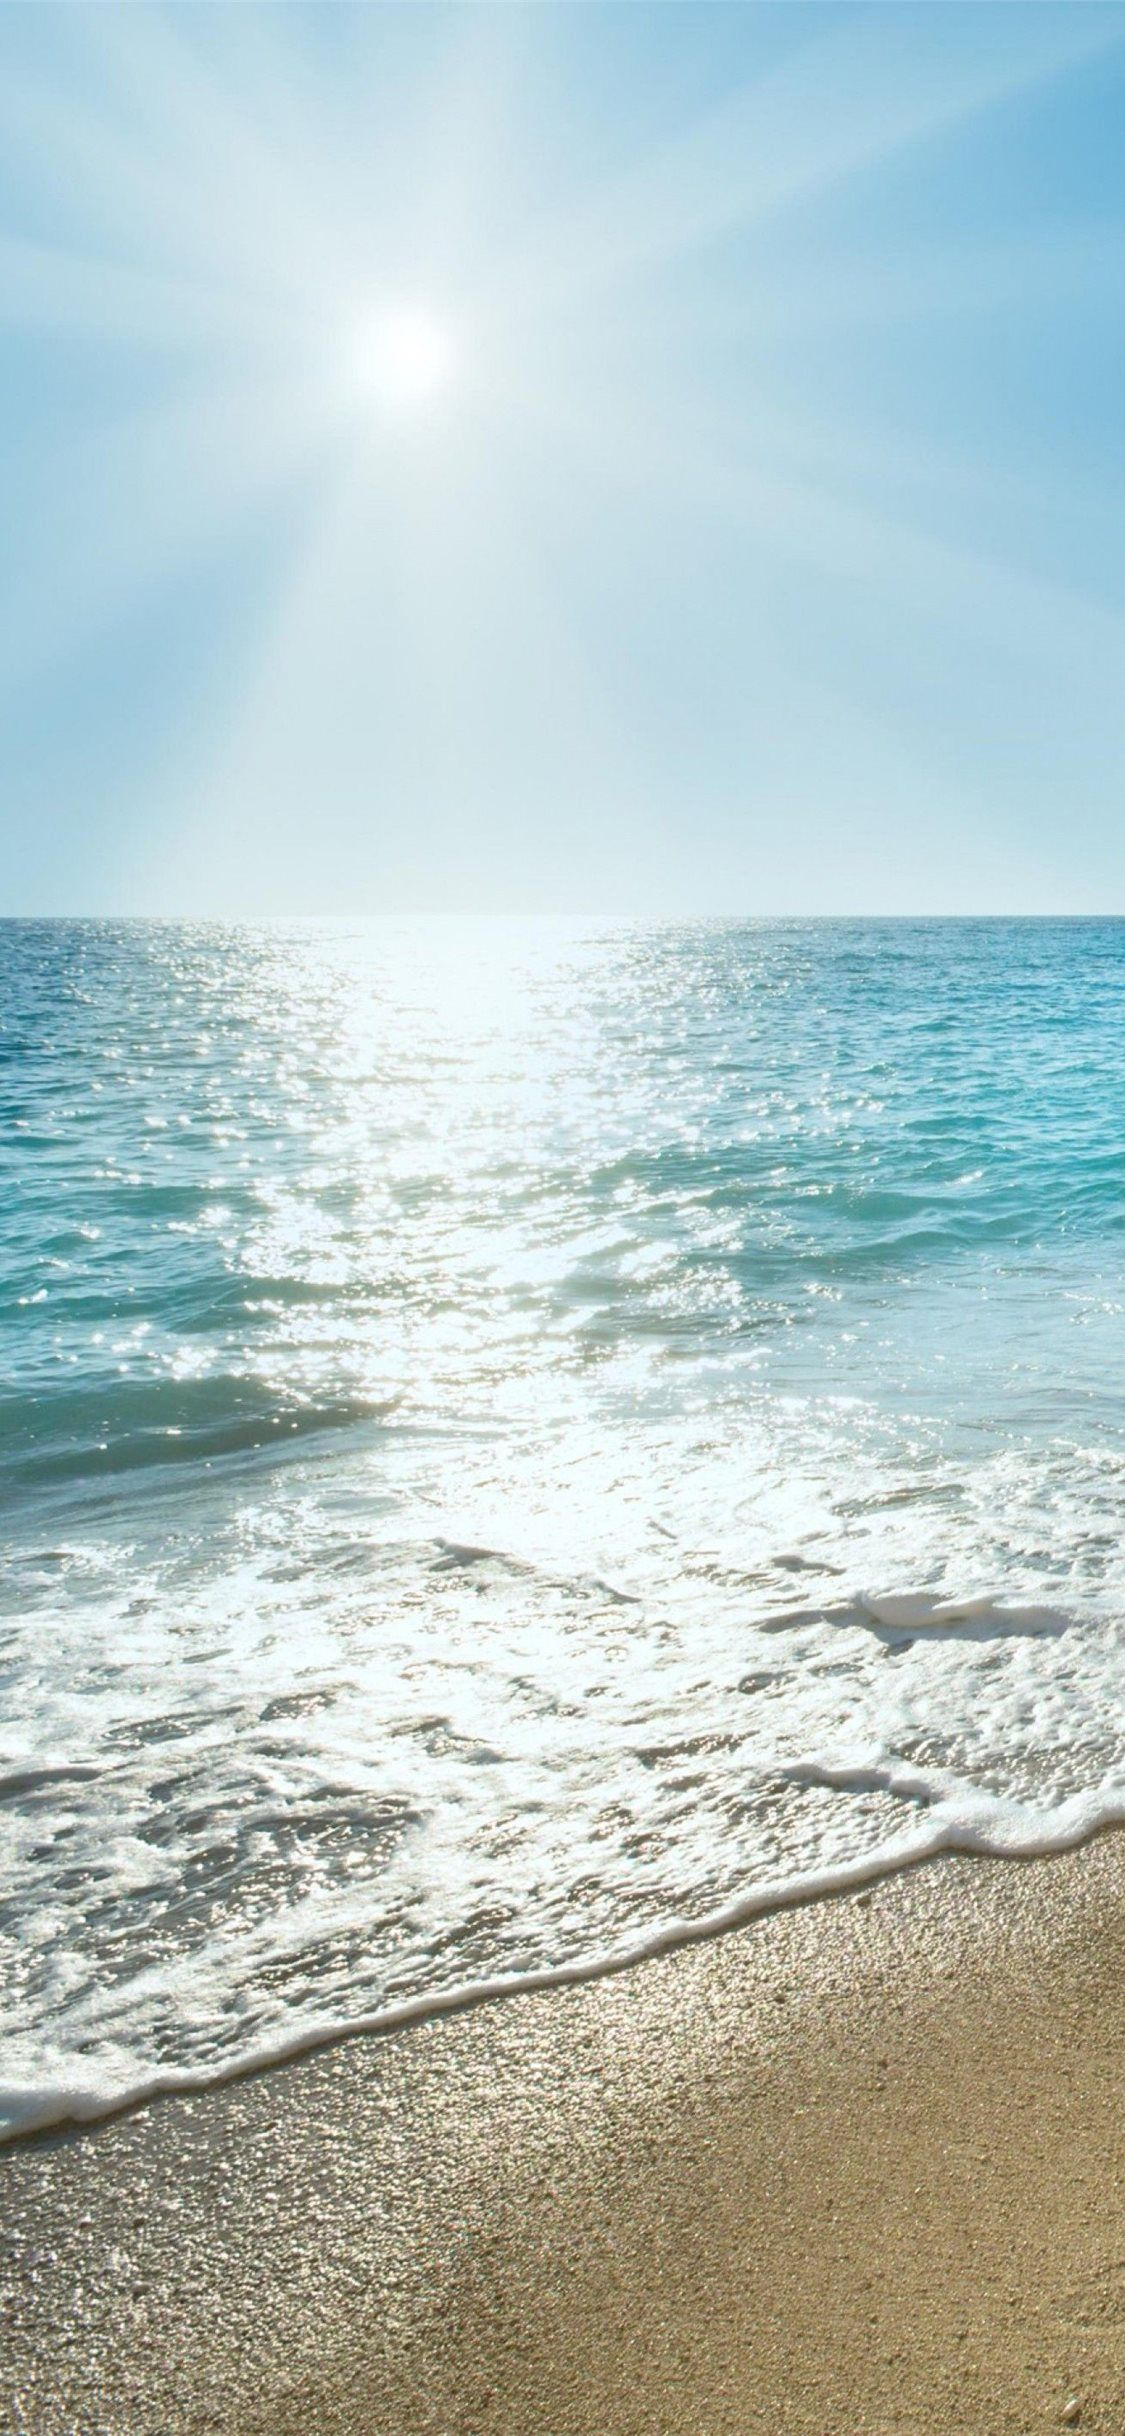 Beach Top Free Beach Wallpaperaccess Summerfor Trends Iphonexwallpaper Summer Beach Wallpaper Beach Wallpaper Iphone Beach Wallpaper